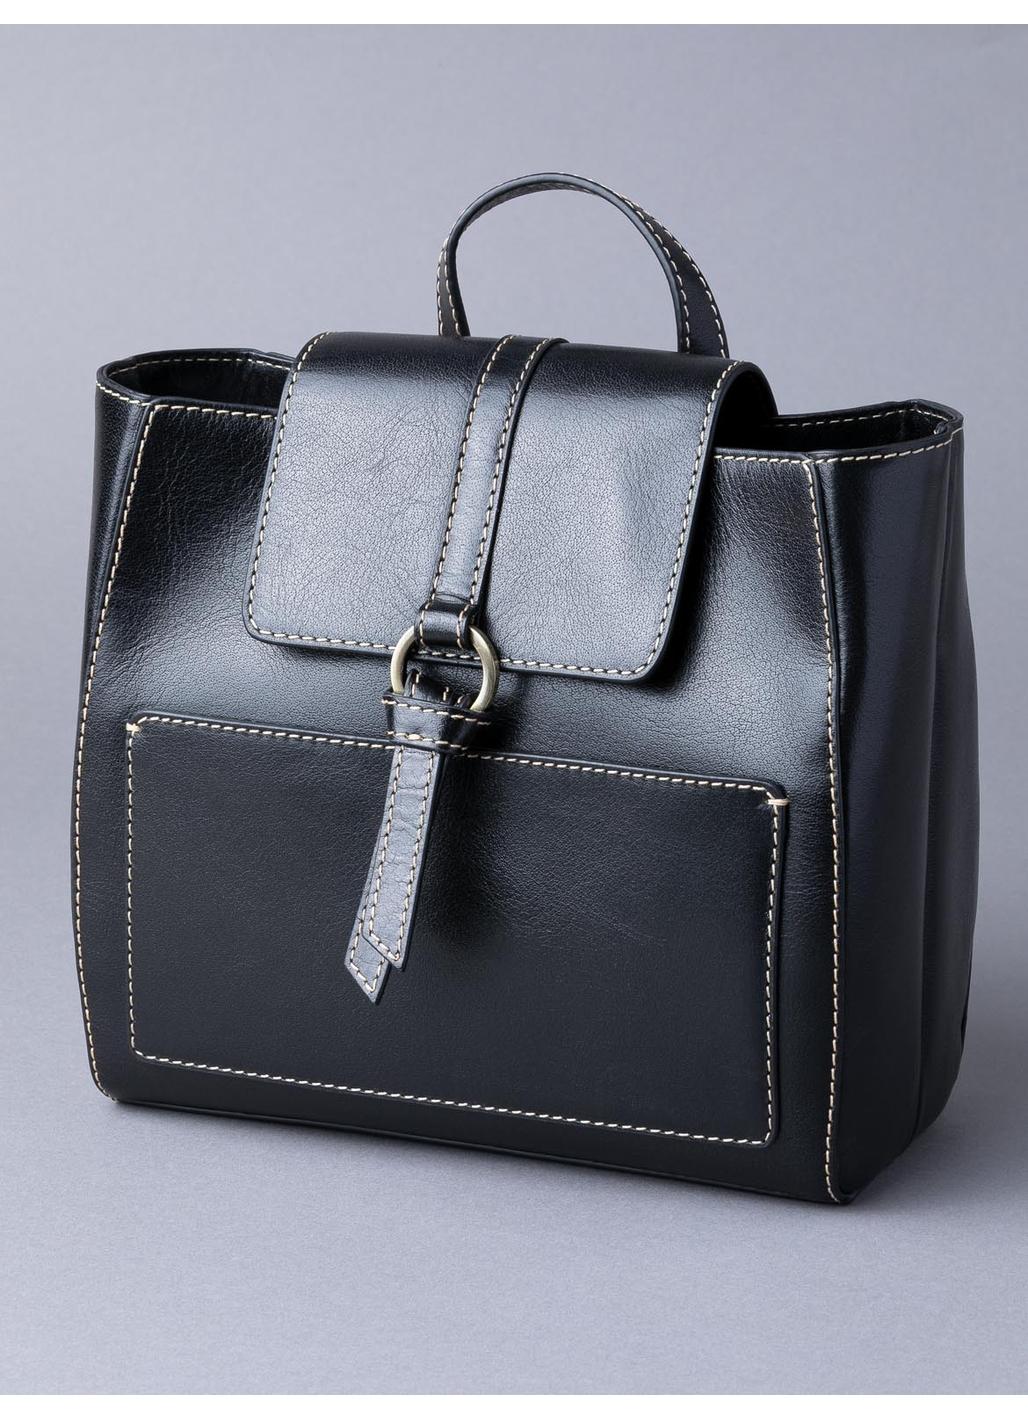 Birthwaite Leather Backpack in Black